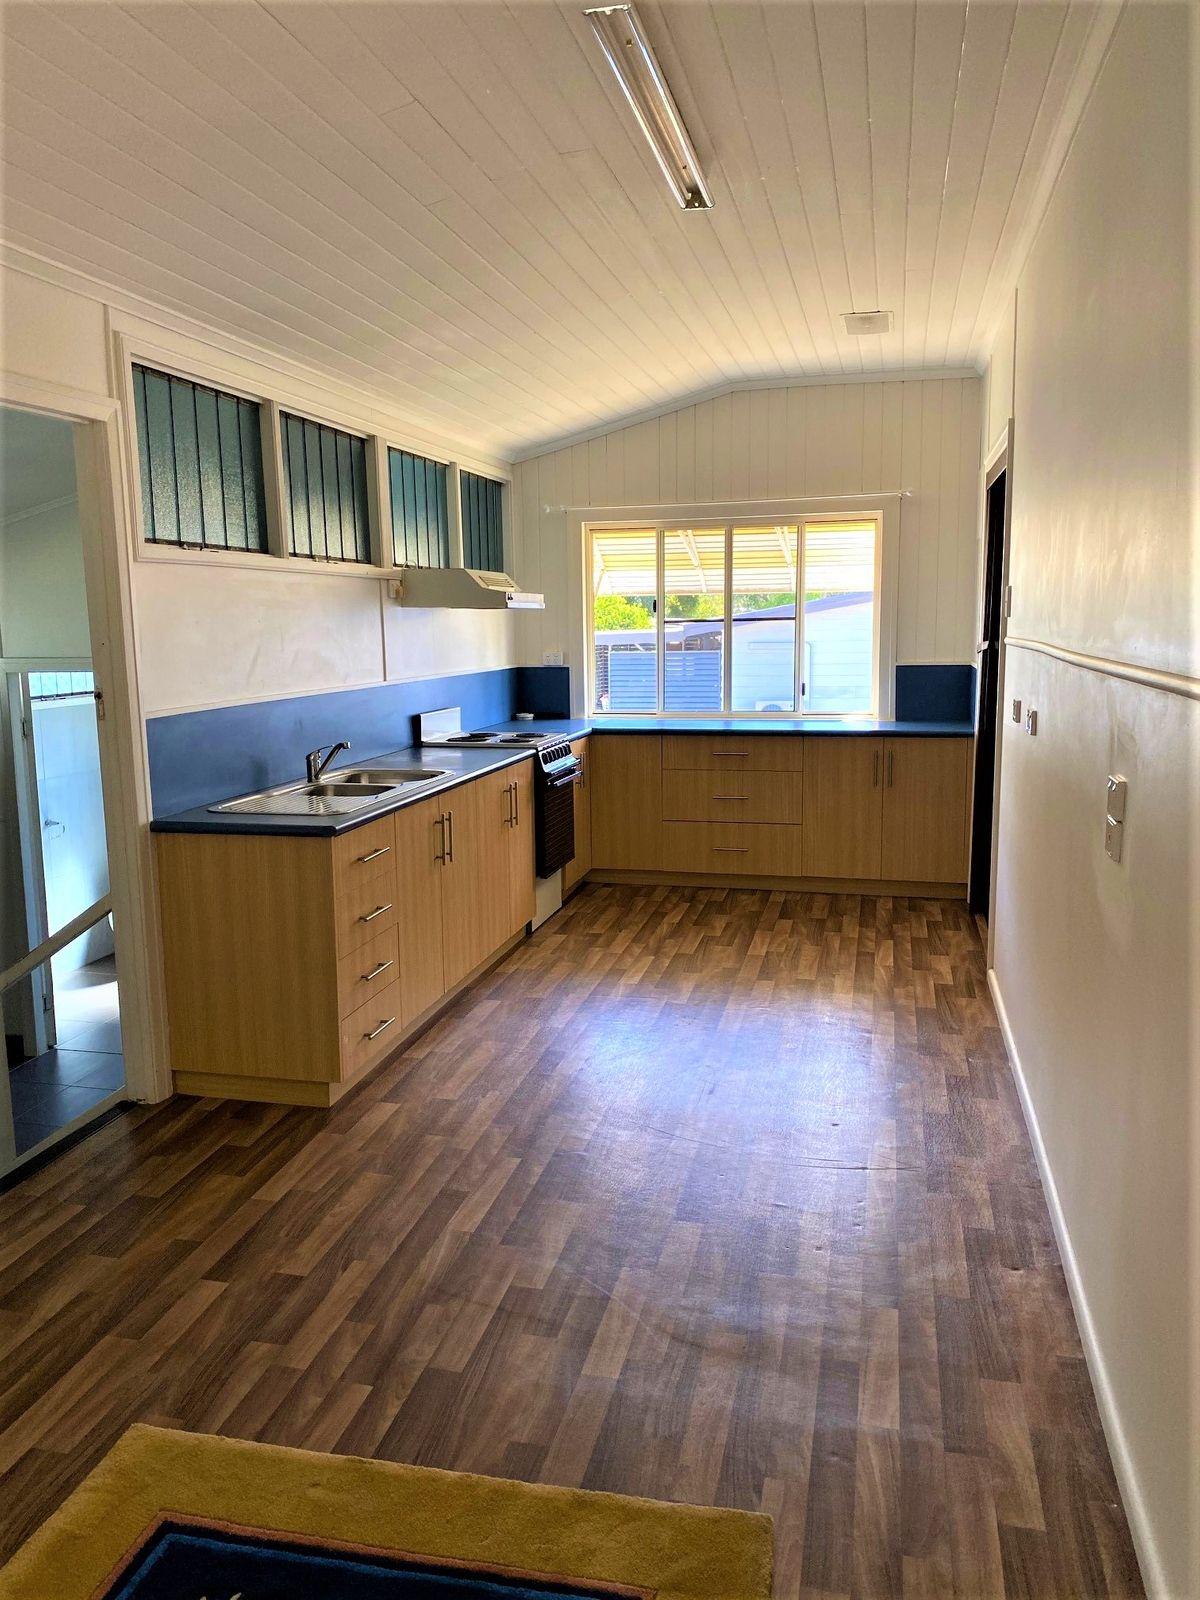 44 Sarina Beach Road, Sarina, QLD 4737